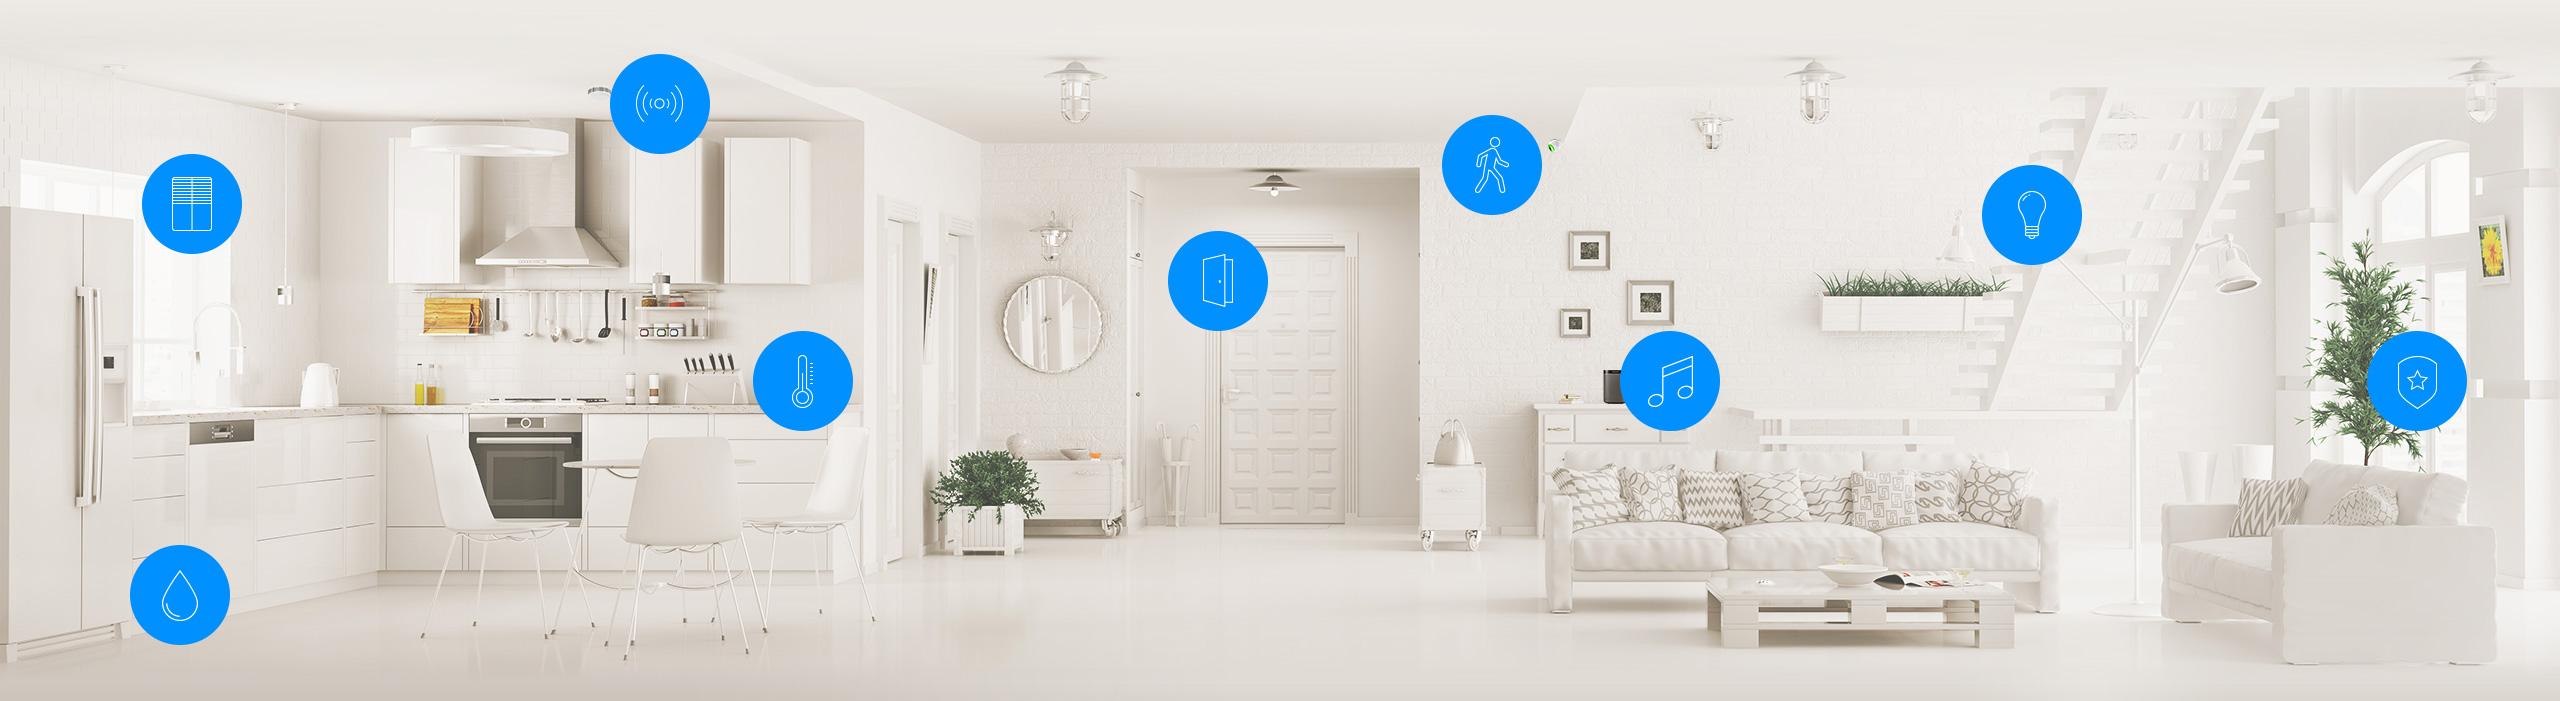 smart home Dati sicuri